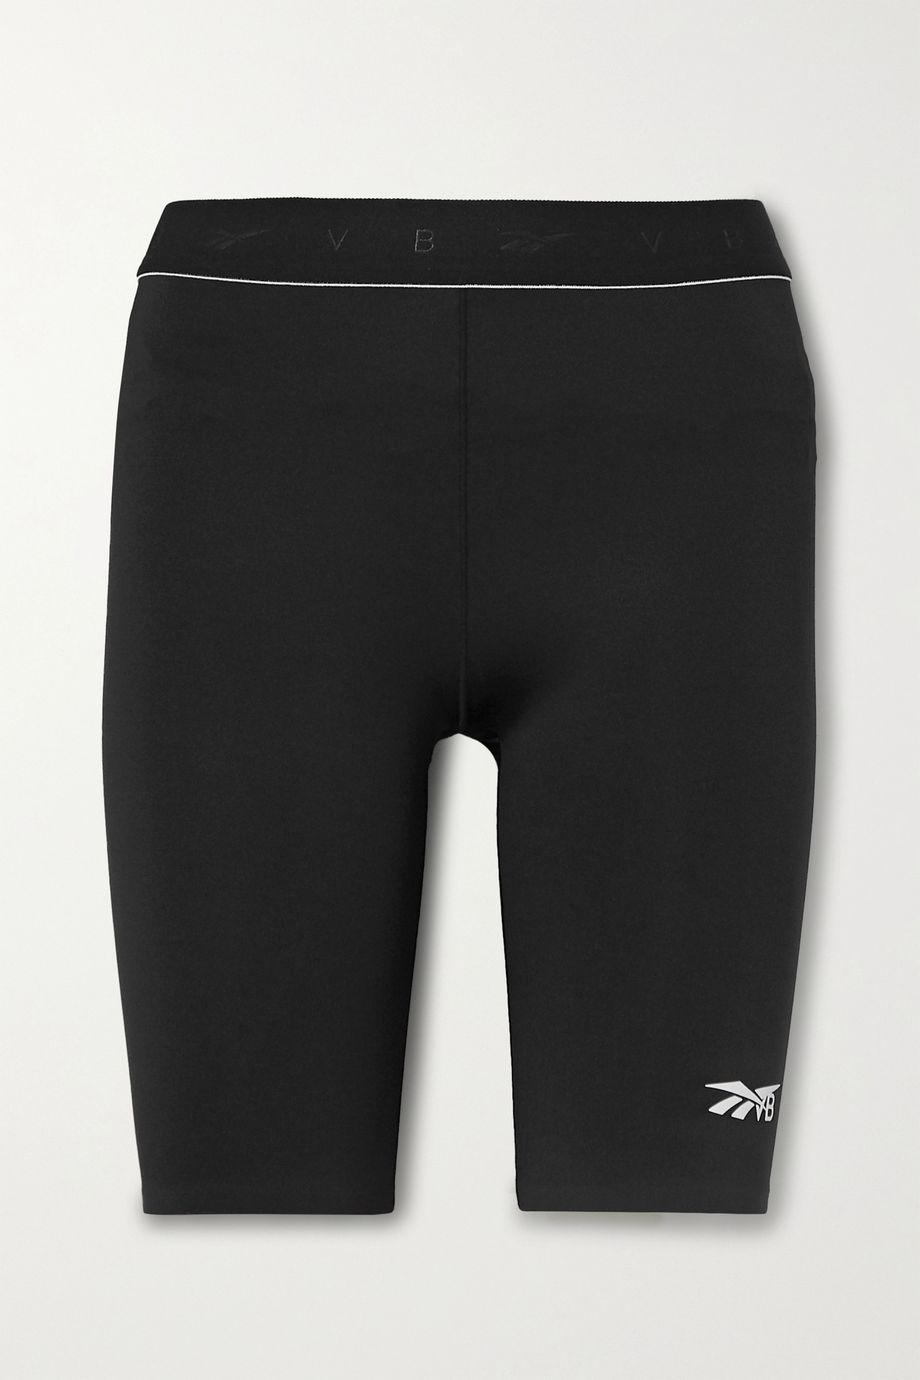 Reebok X Victoria Beckham Stretch shorts